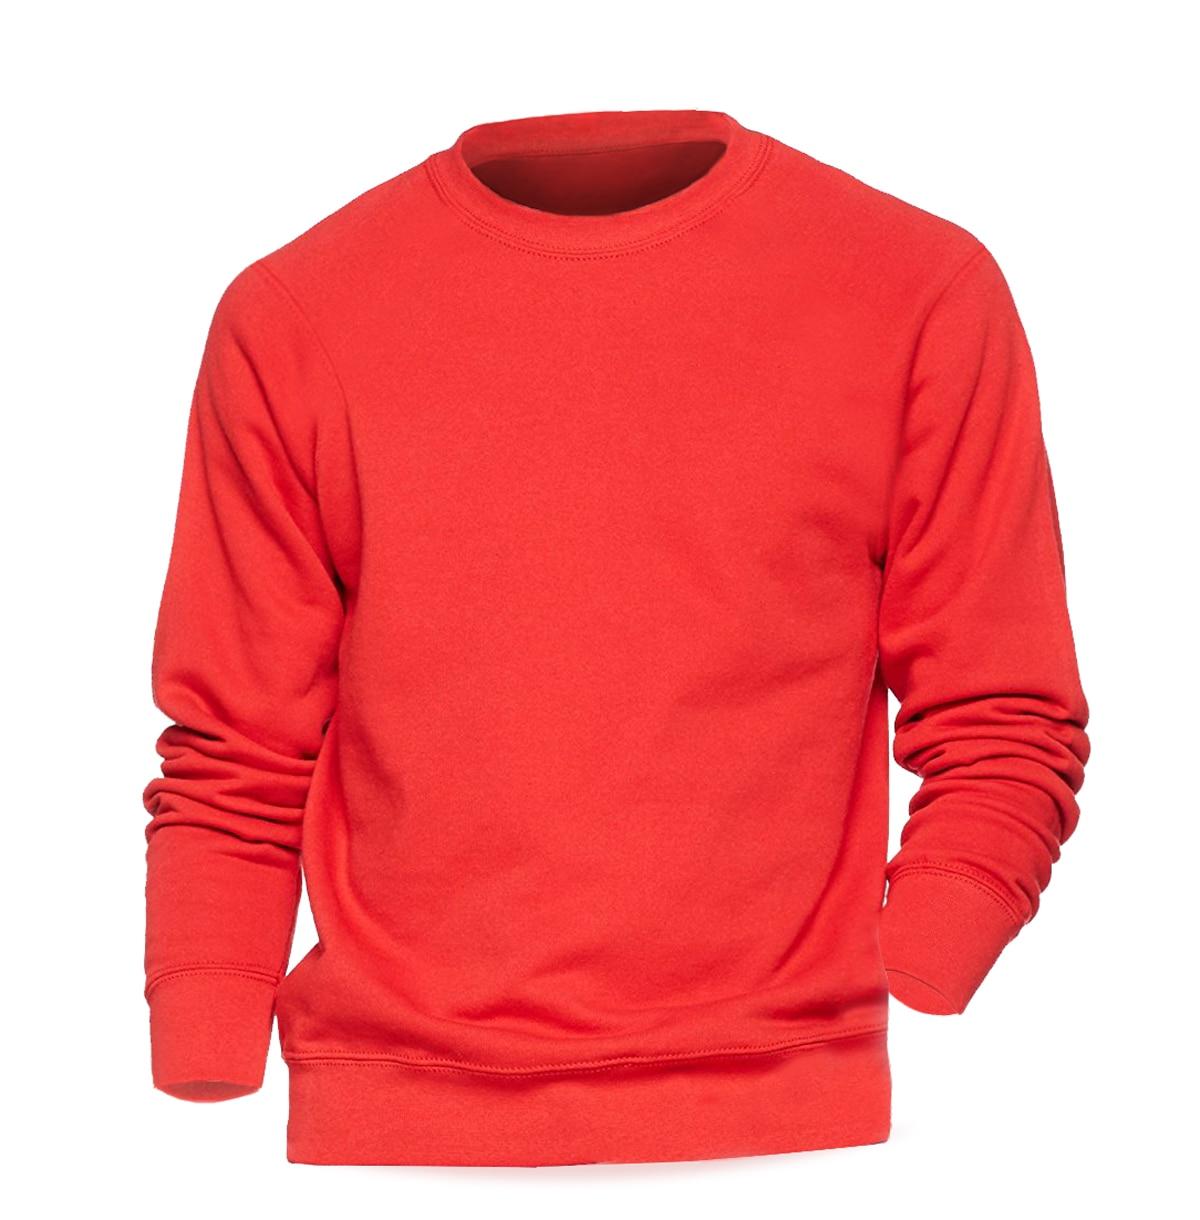 Solid color Sweatshirt Men Hoodie Crewneck Sweatshirts Winter Autumn Fleece Hoody Casual Gray Blue Red Black White Streetwear 12